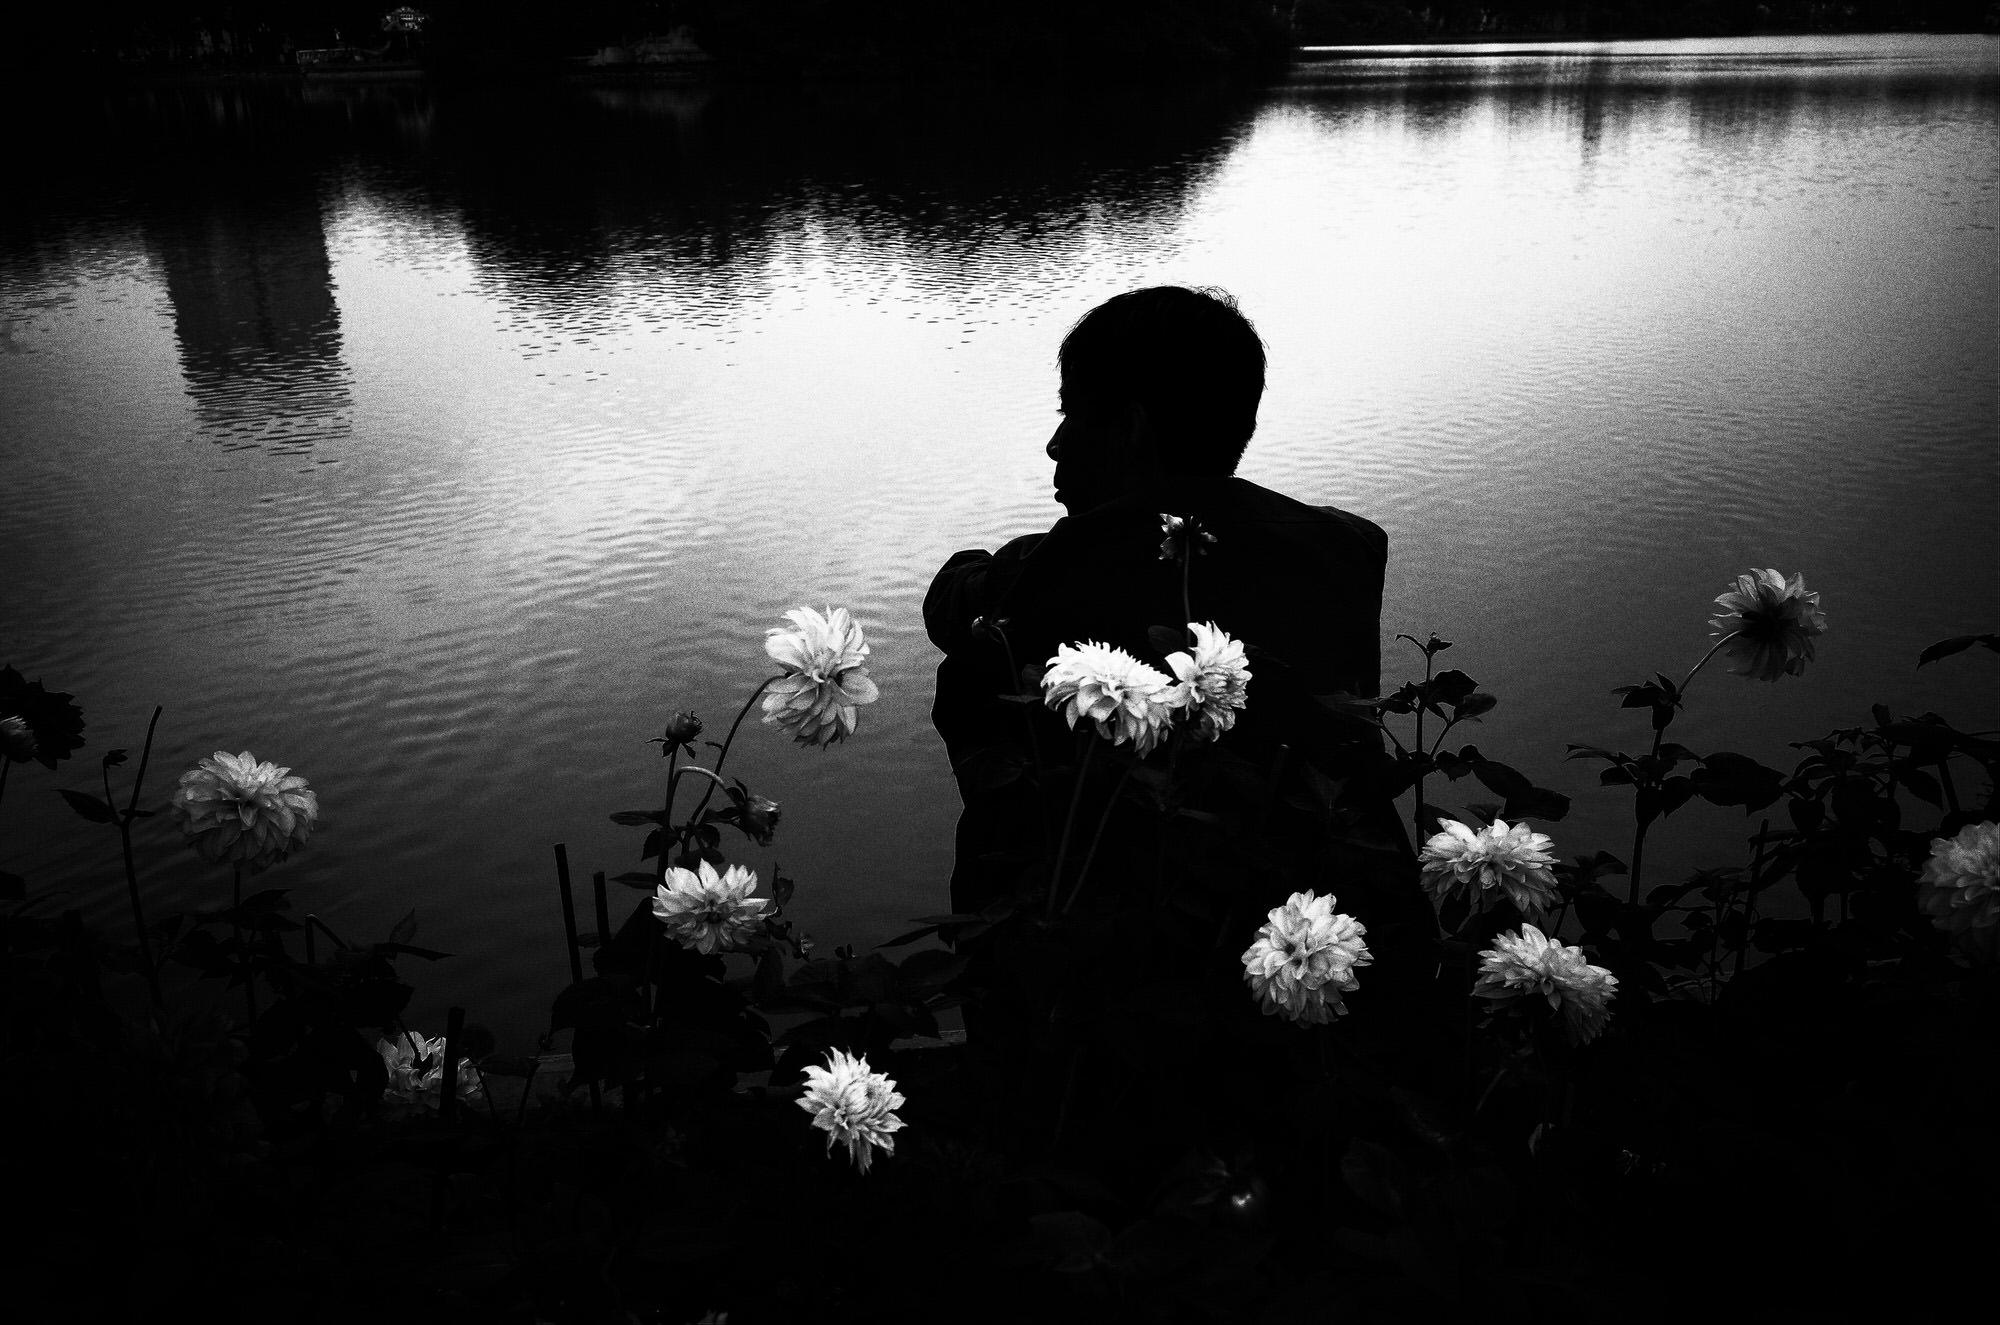 eric kim photography black and white - 32607757835_00e04ca41c_o